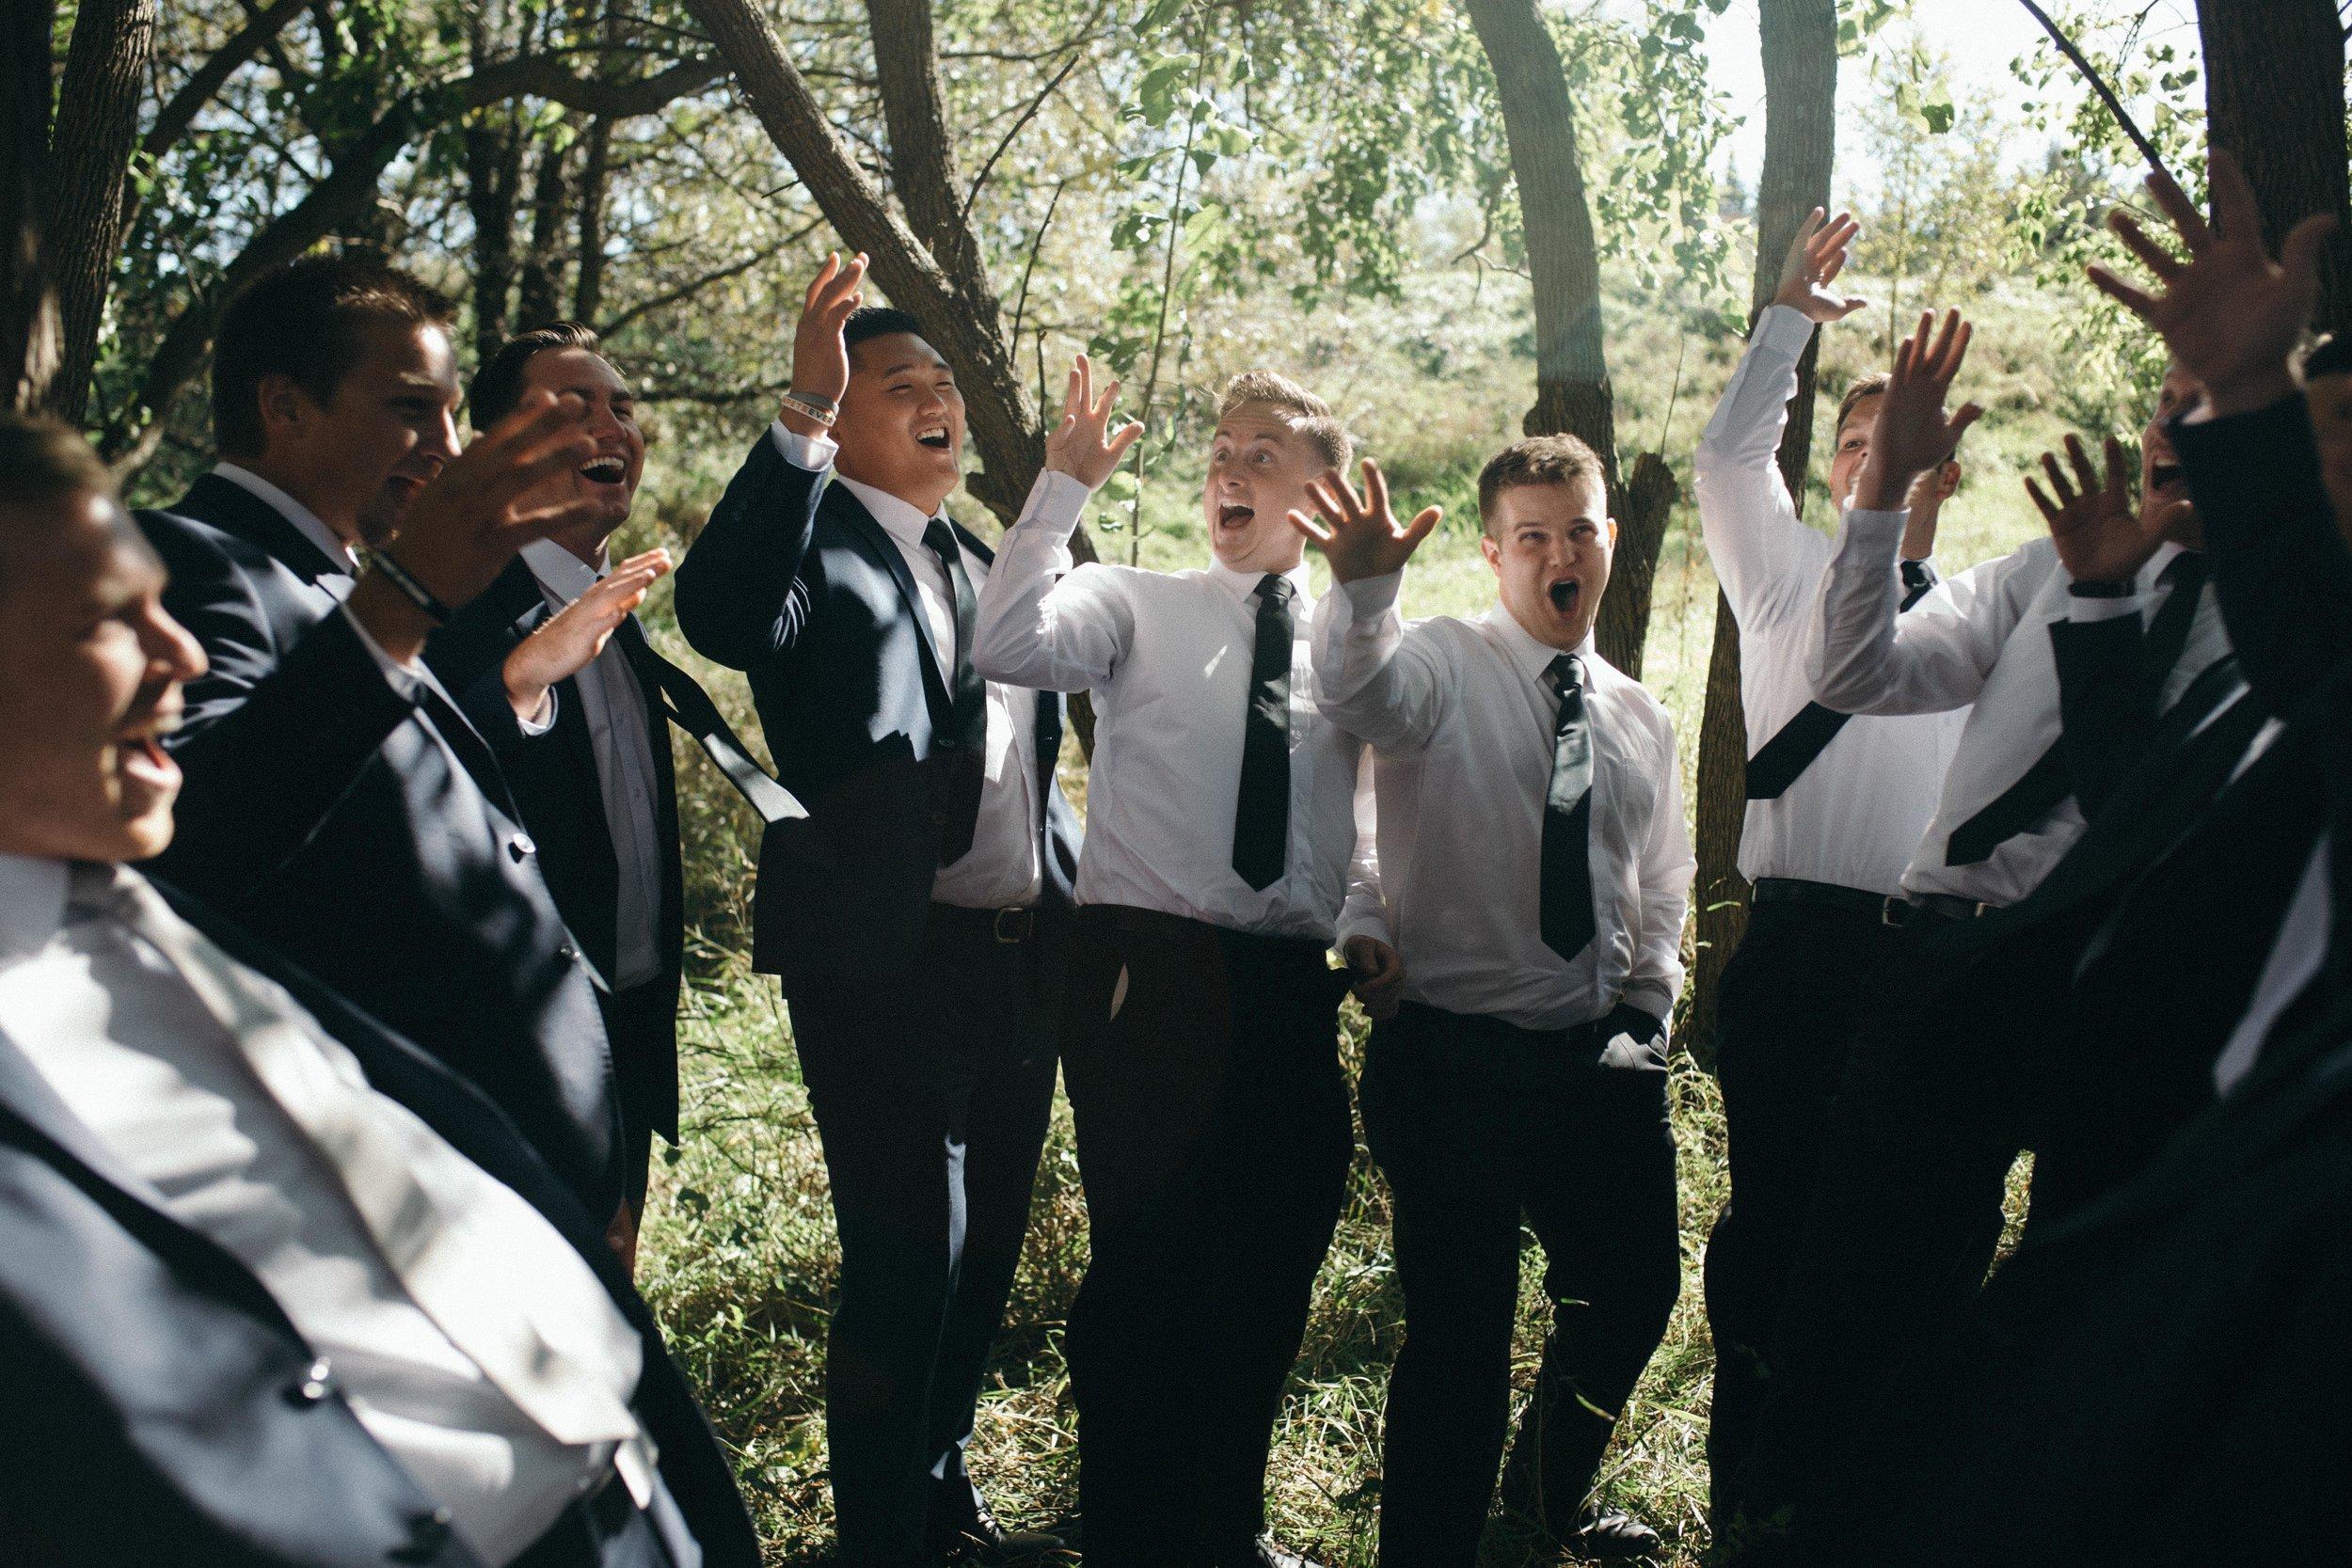 bailey-jared-wedding-blog-44.jpg